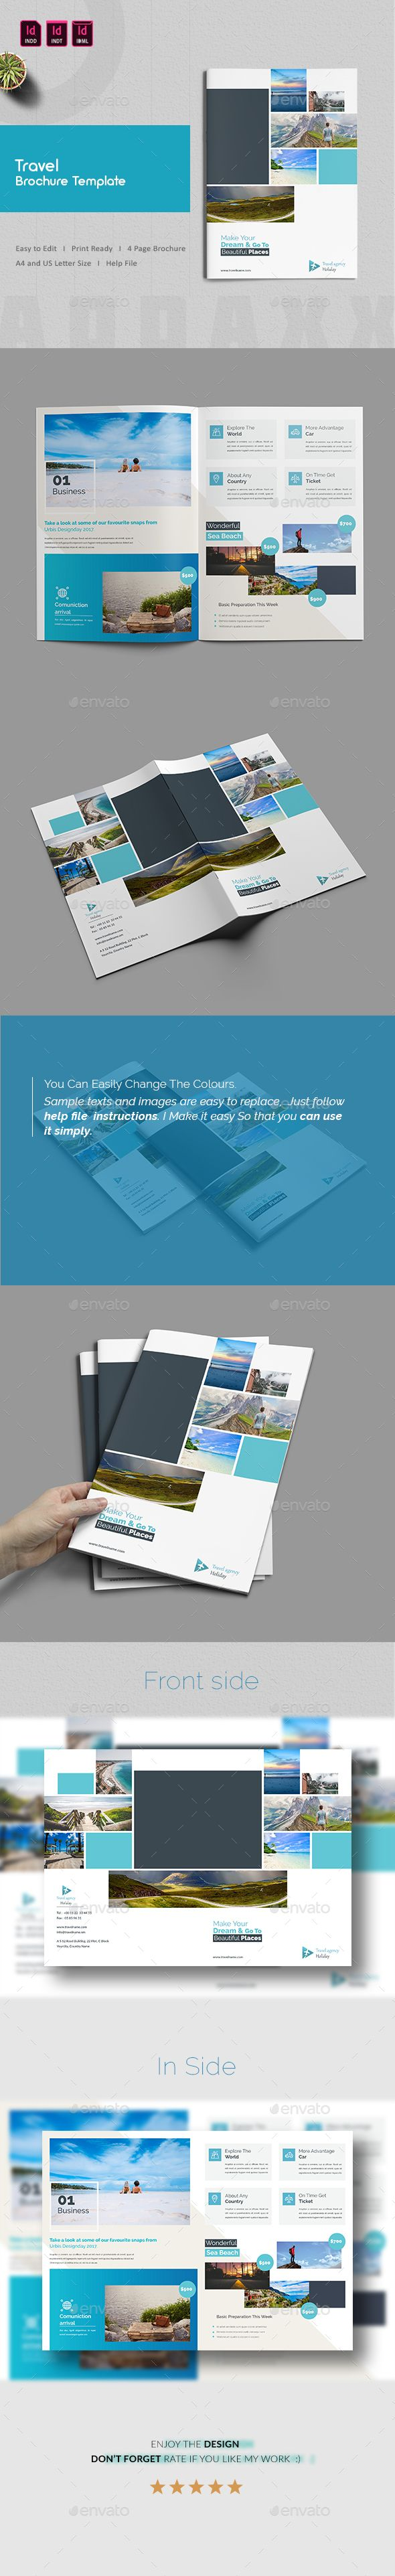 letter size brochure template - best 25 travel brochure template ideas on pinterest